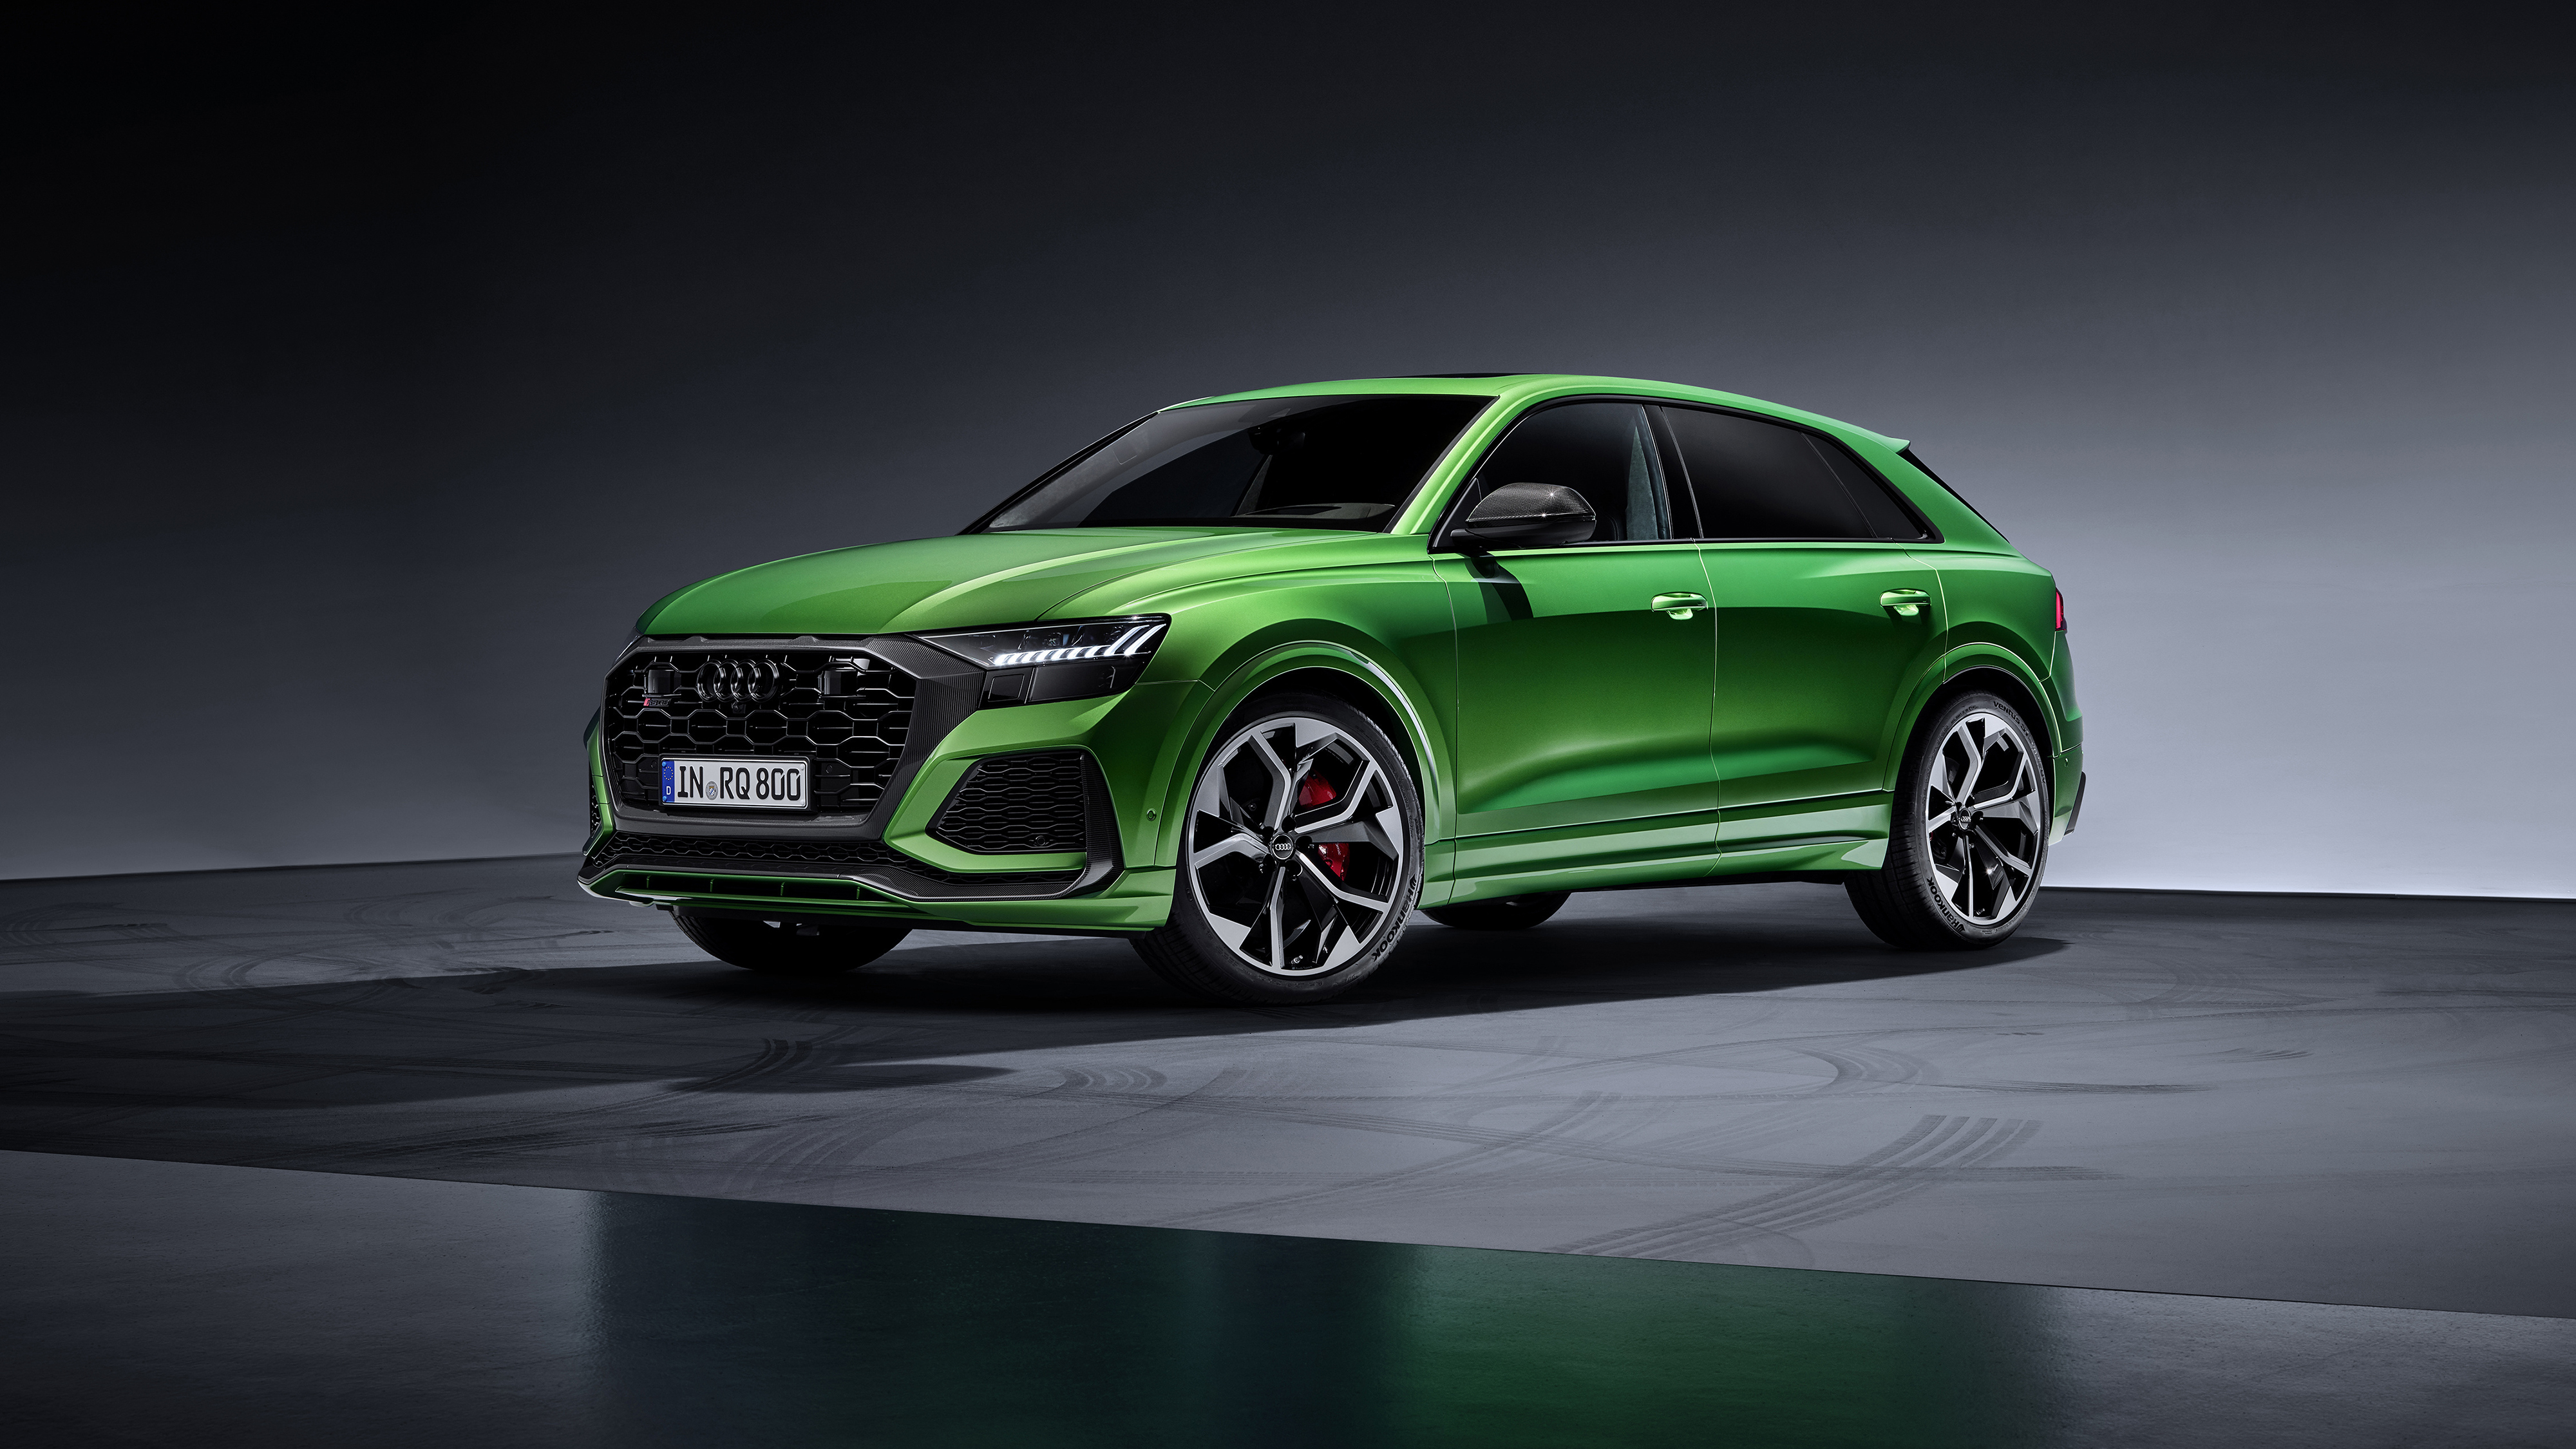 Audi Rs Q8 2020 4k 2 Wallpaper Hd Car Wallpapers Id 13710